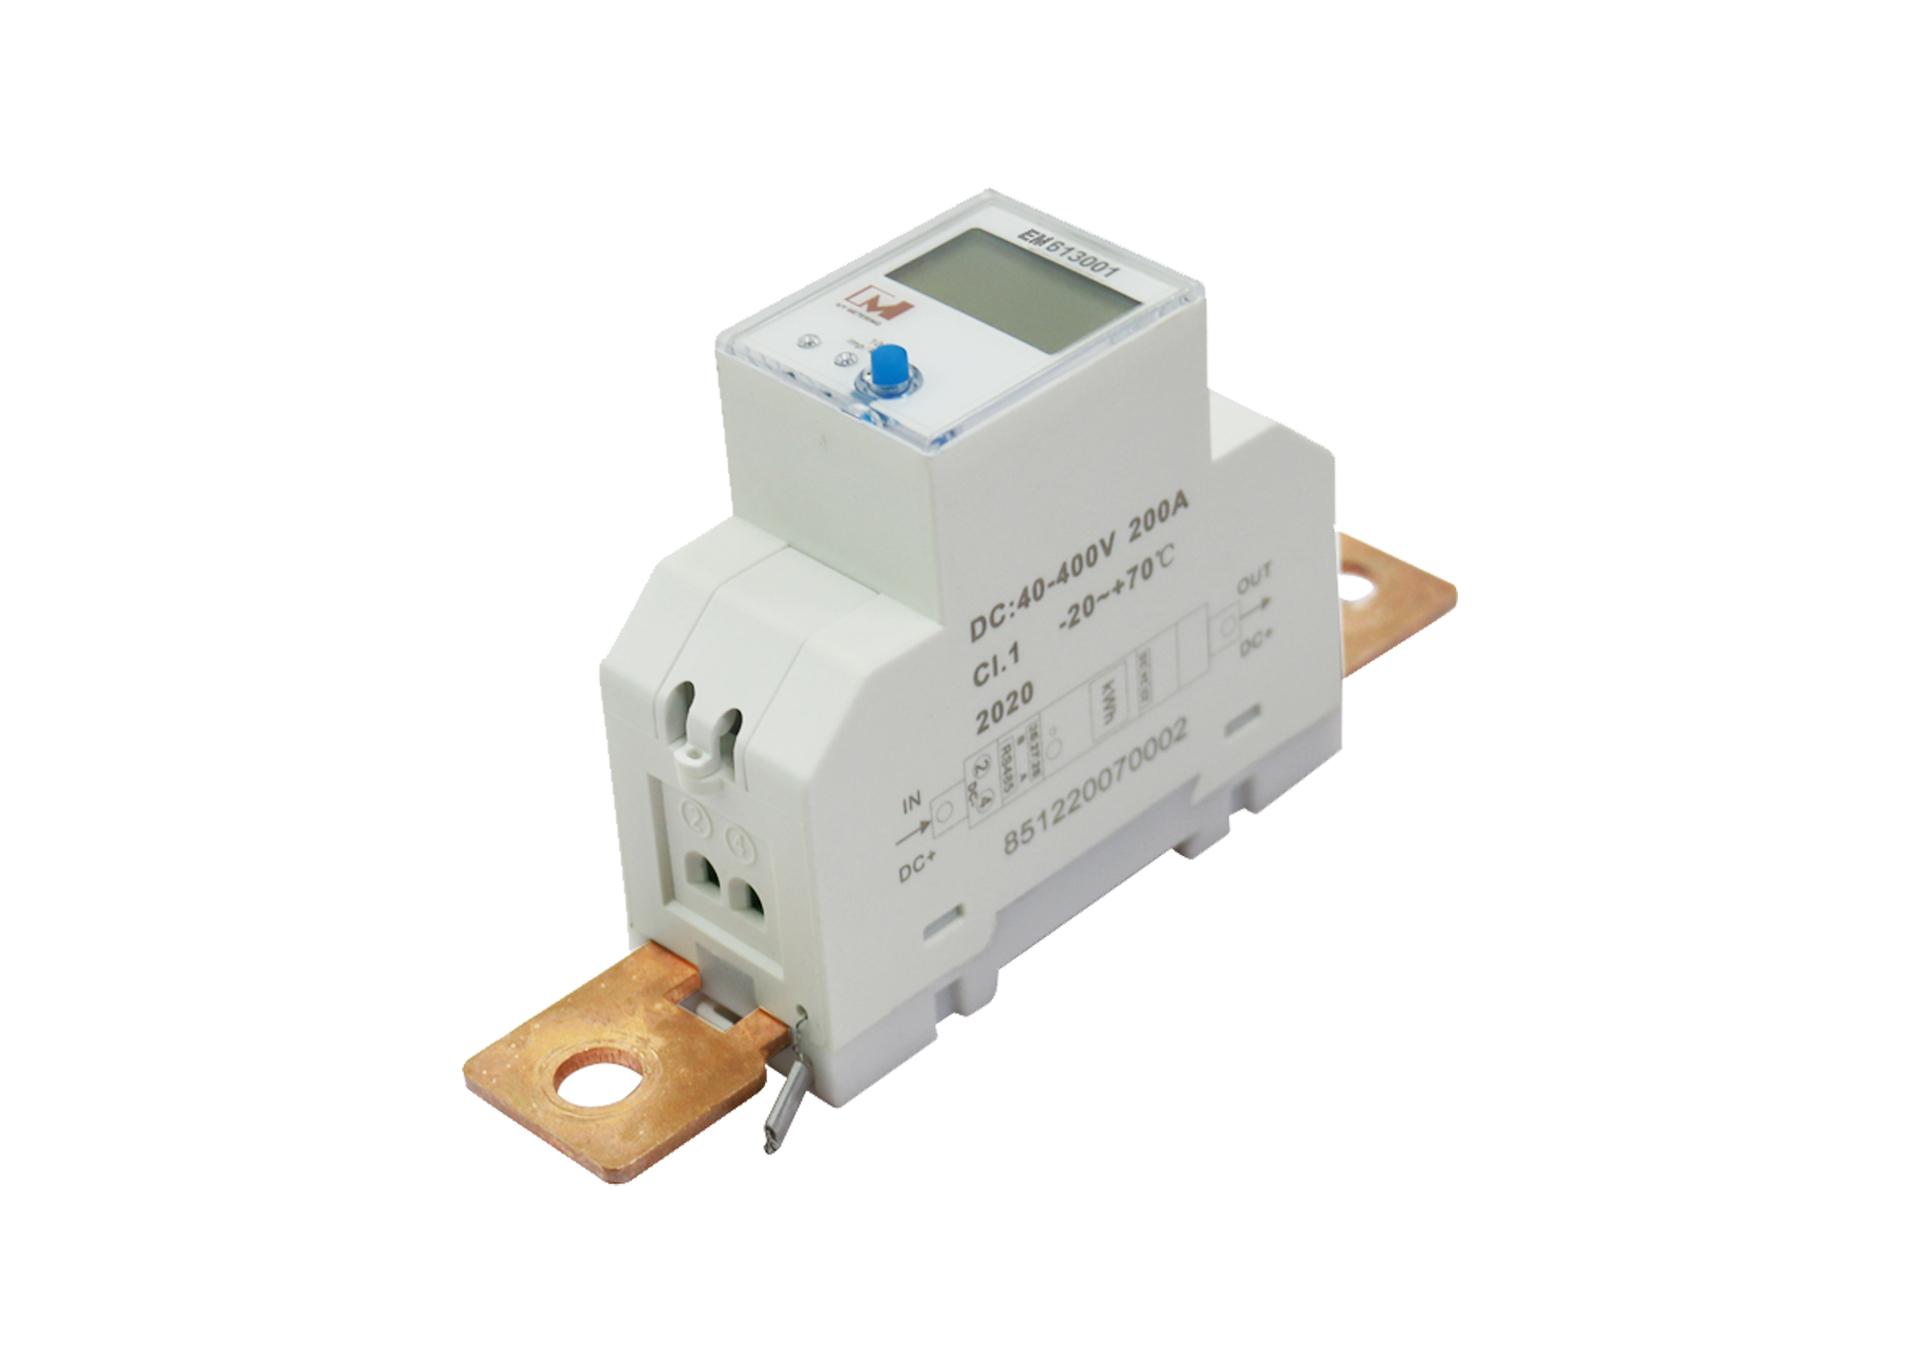 EM613001 LCD Display Digital RS485 DC Multifunction Battery Monitor Solar Energy Meter